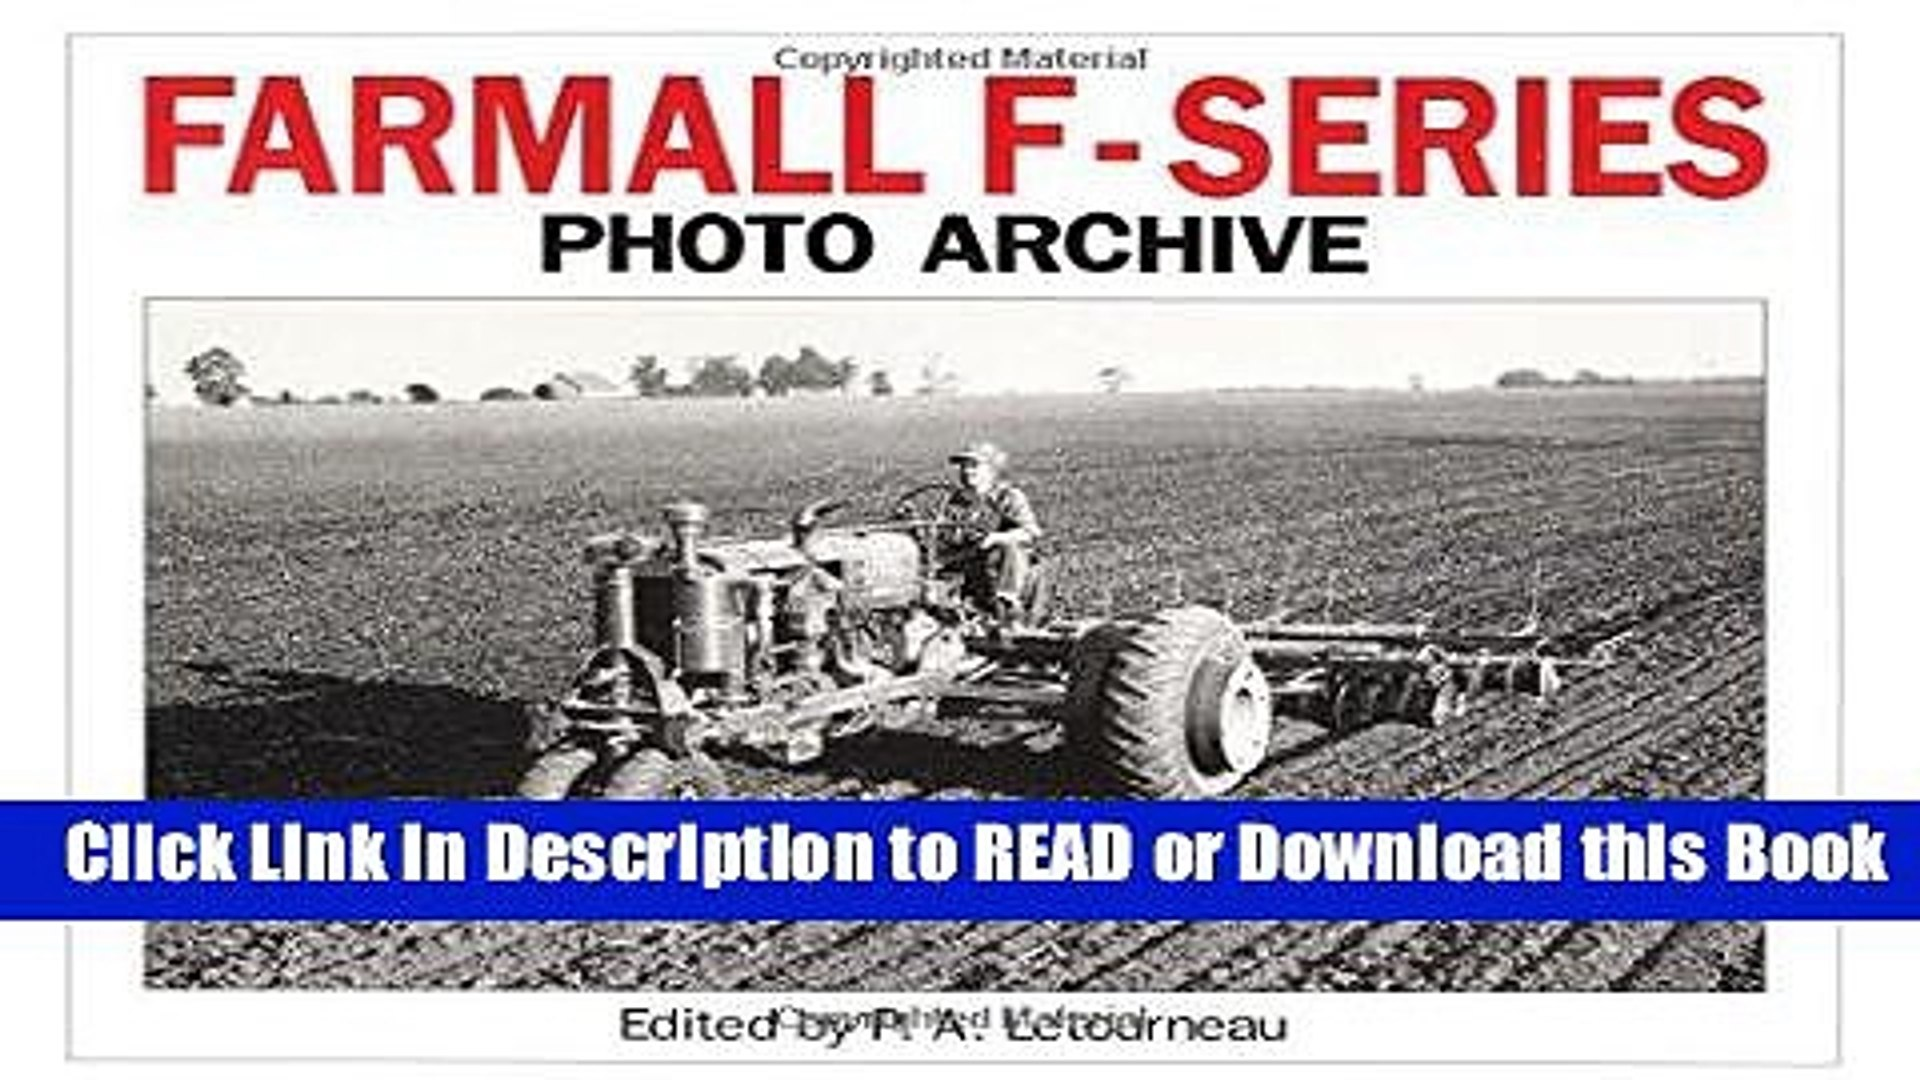 Books Farmall F Series Photo Archive: The Models F-12, F-14, F-20 and F-30 Free Books